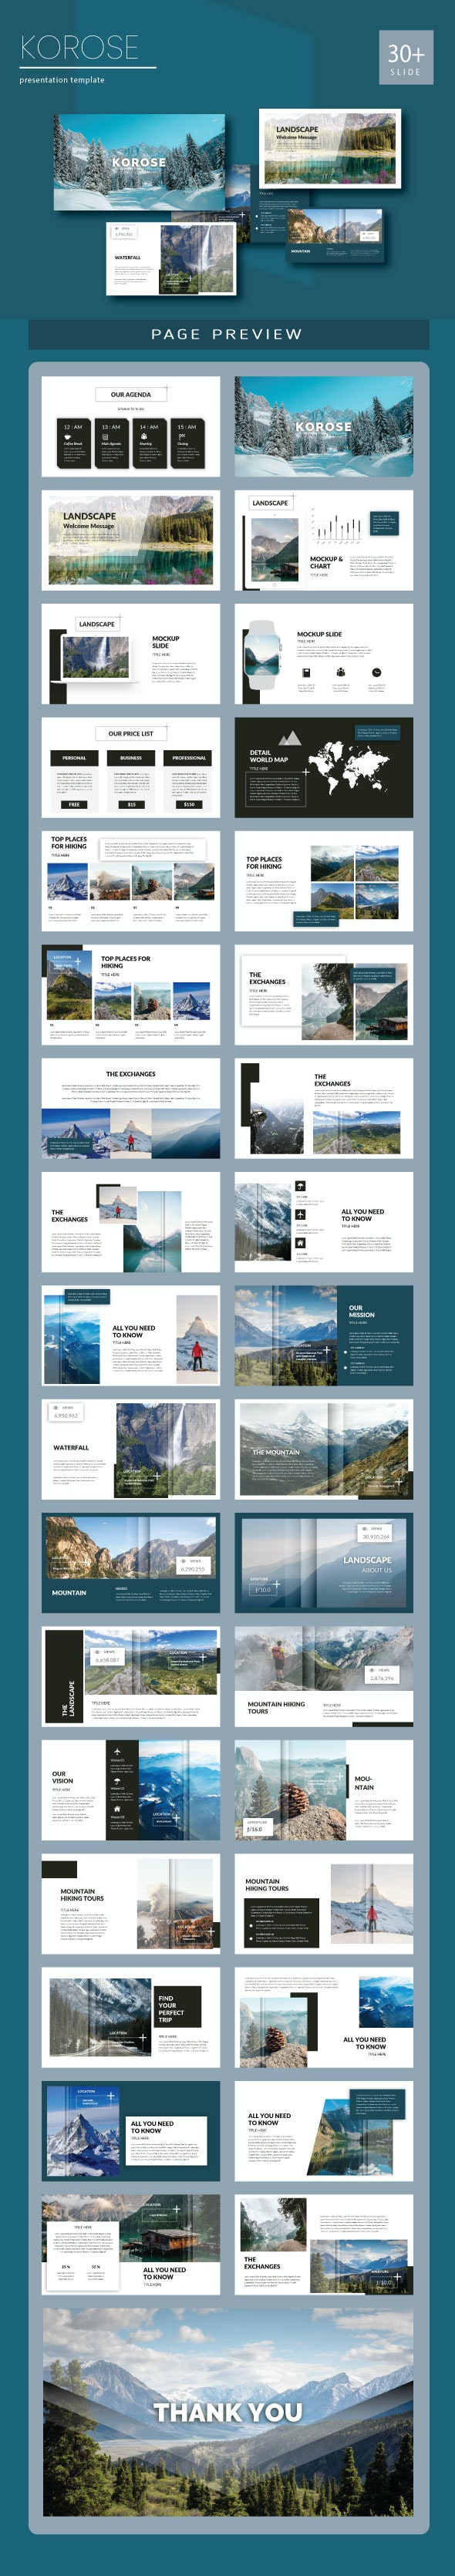 Korose Google slide Templates - Creative PowerPoint Templates